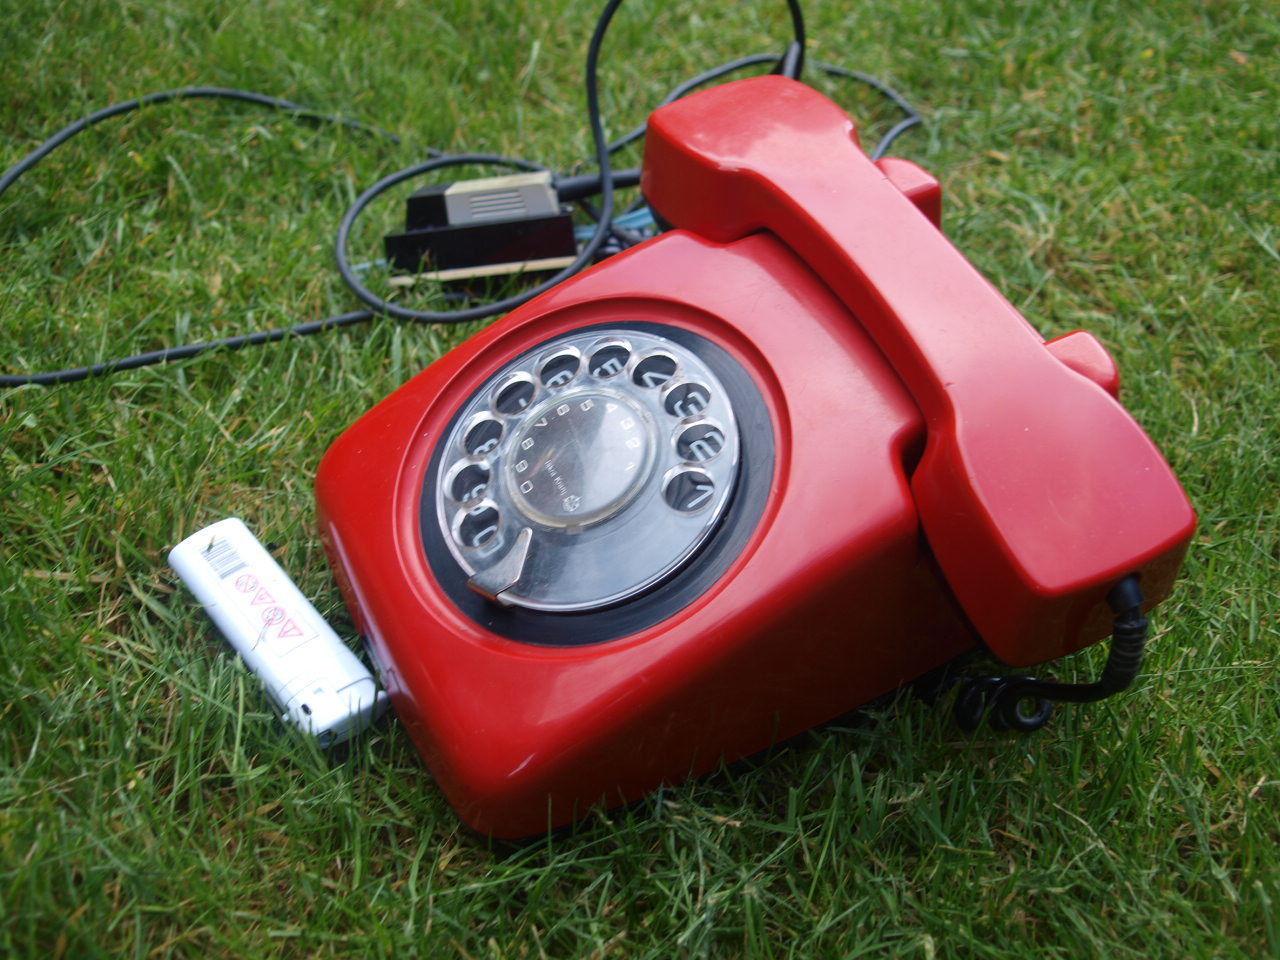 VINTAGE RARE SOVIET YUGOSLAVIA ROTARY DIAL PHONE ETA-62 RED BLACK COLOR